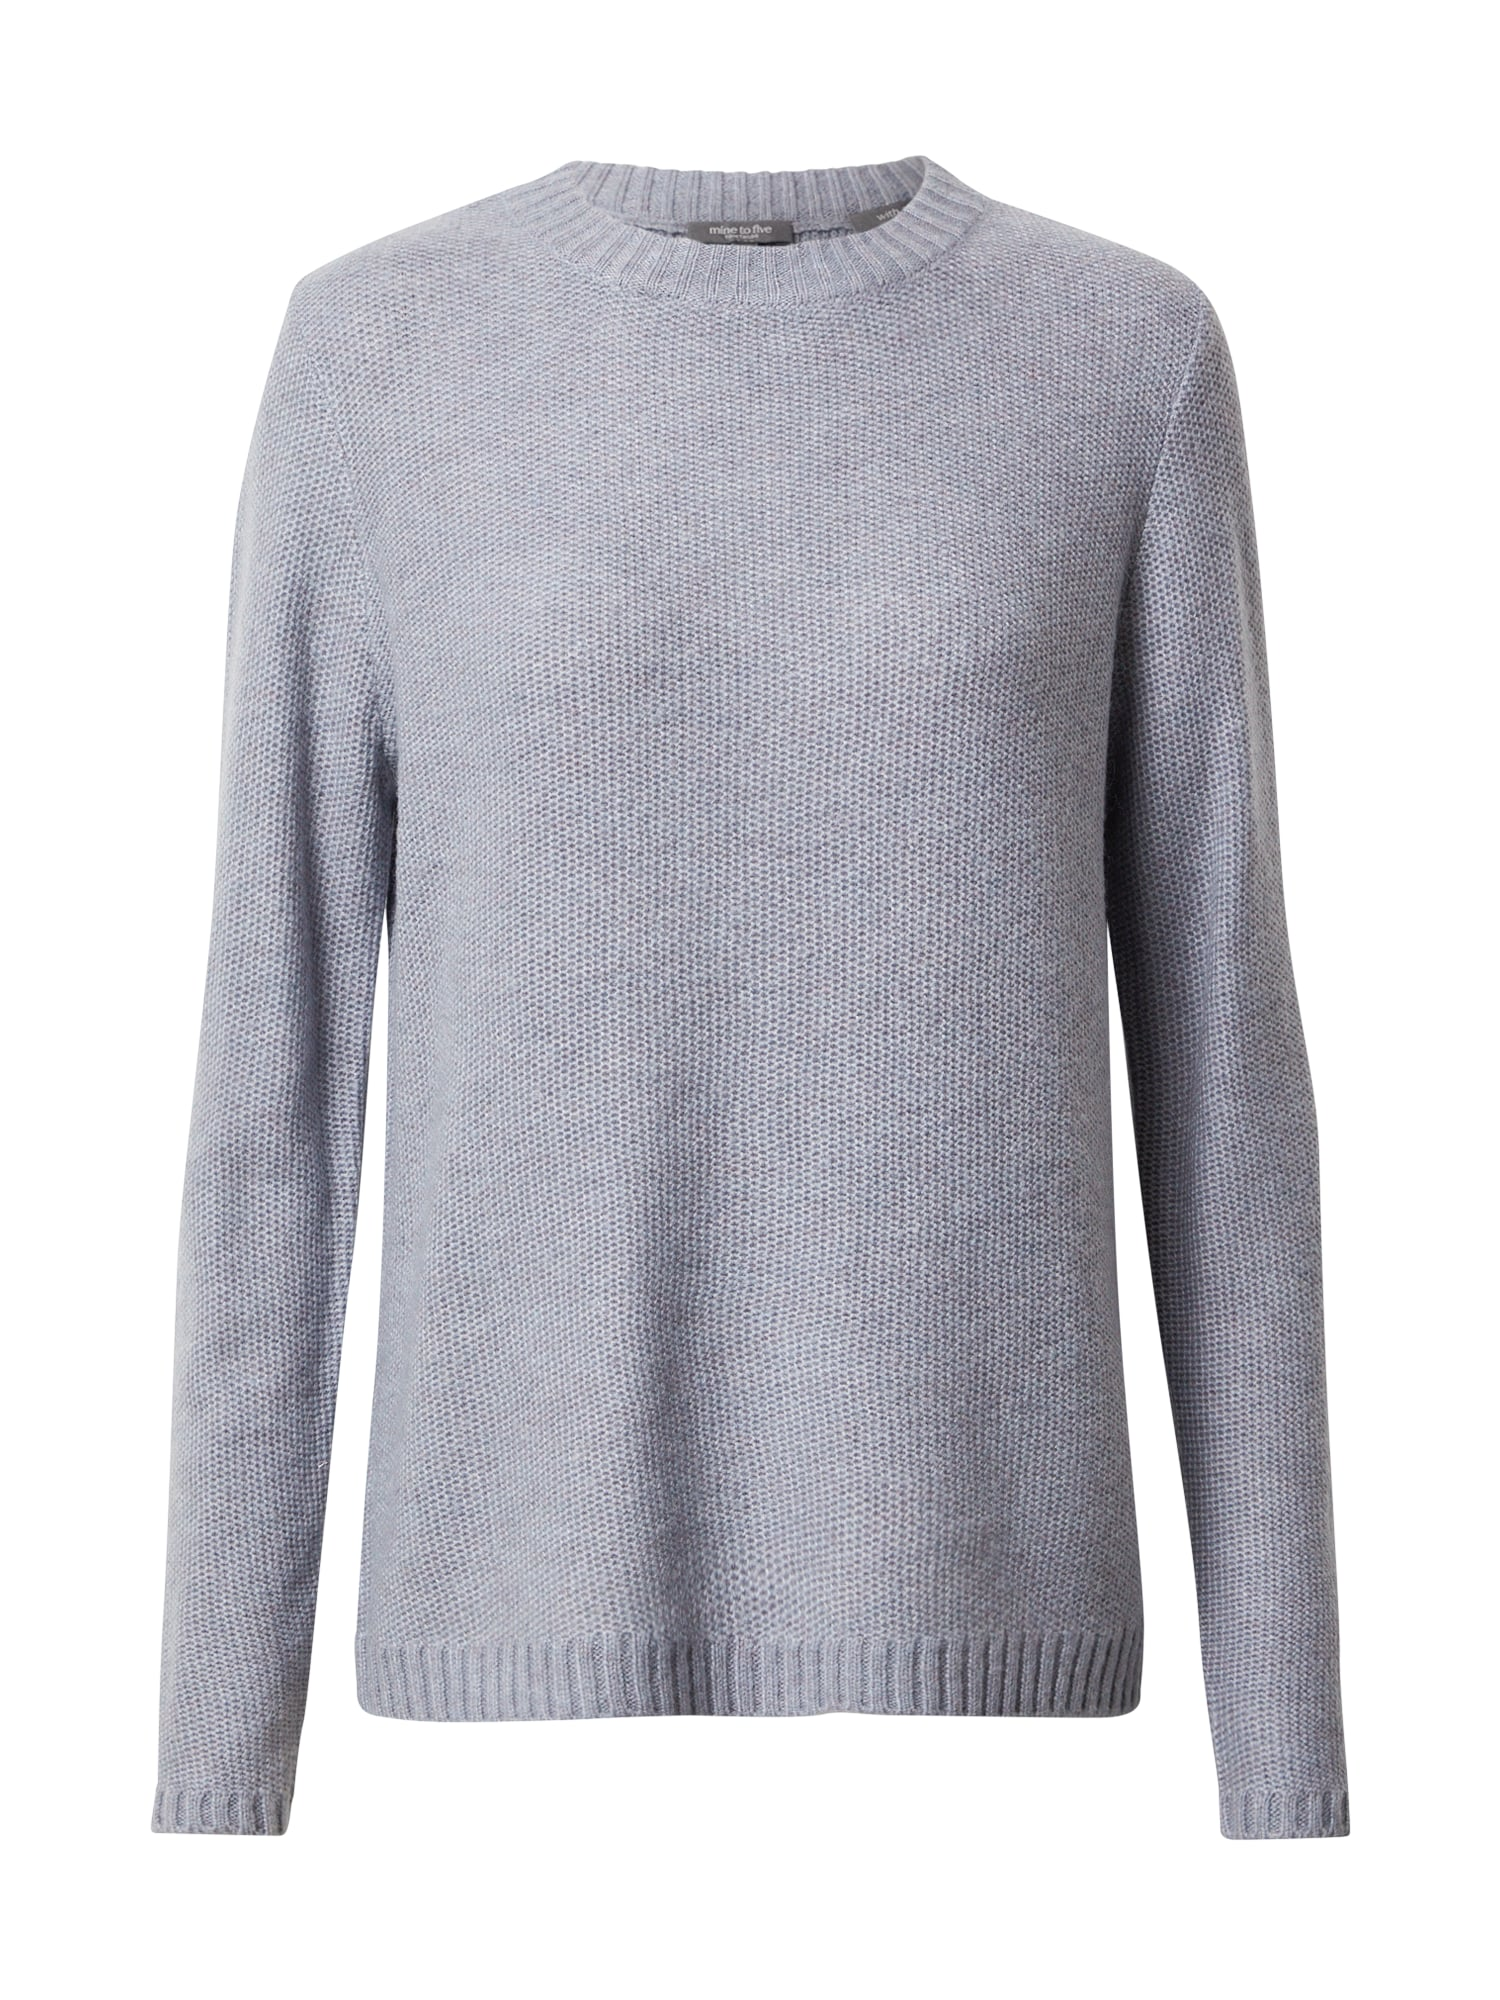 MINE TO FIVE Megztinis mėlyna dūmų spalva